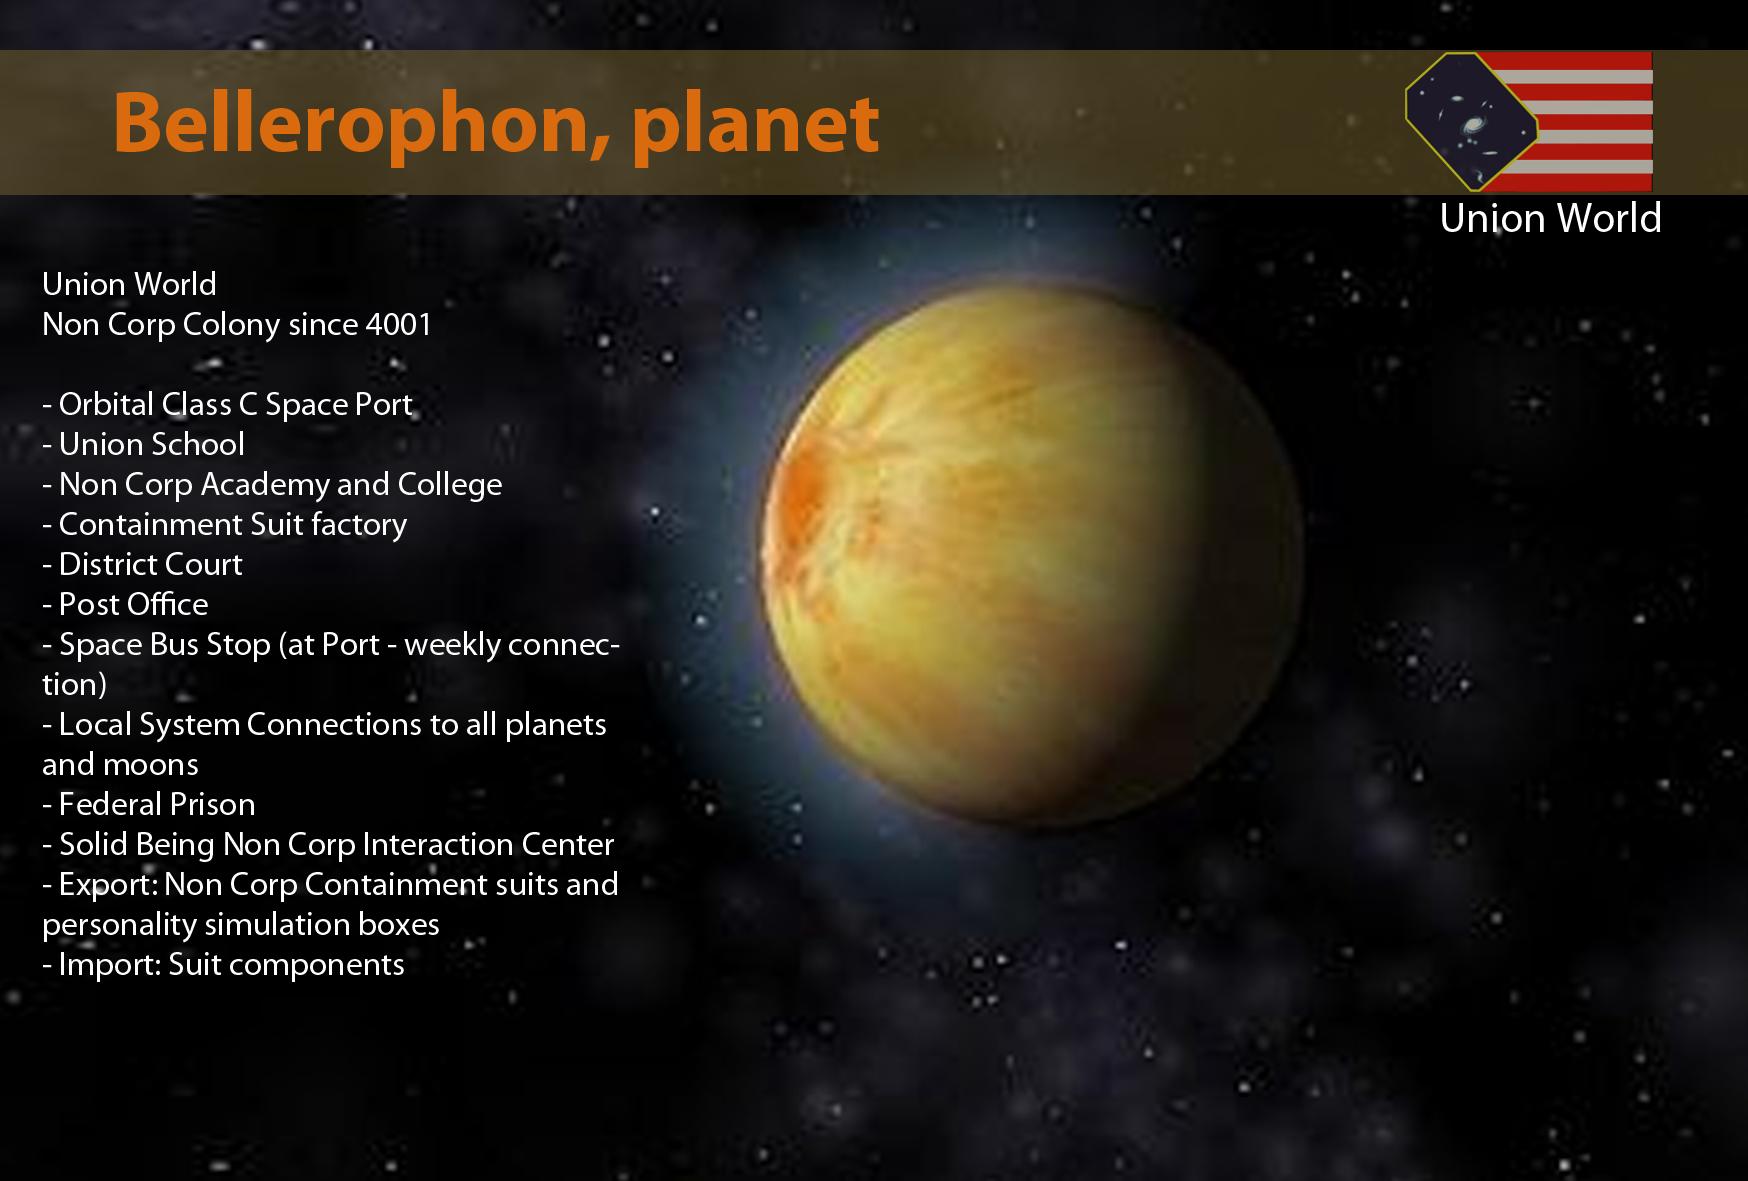 Bellerophon, planet